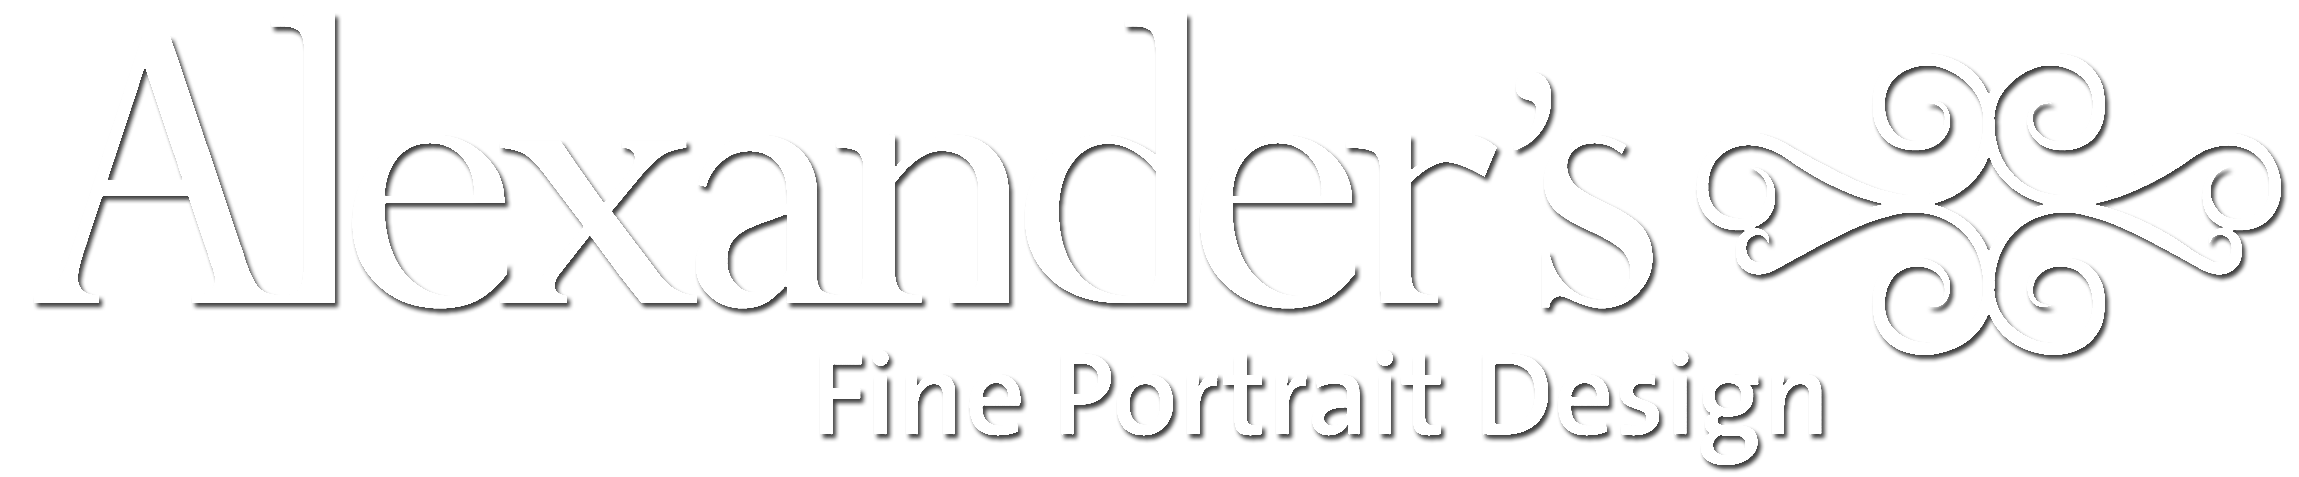 Alexander's Fine Portrait Desgin